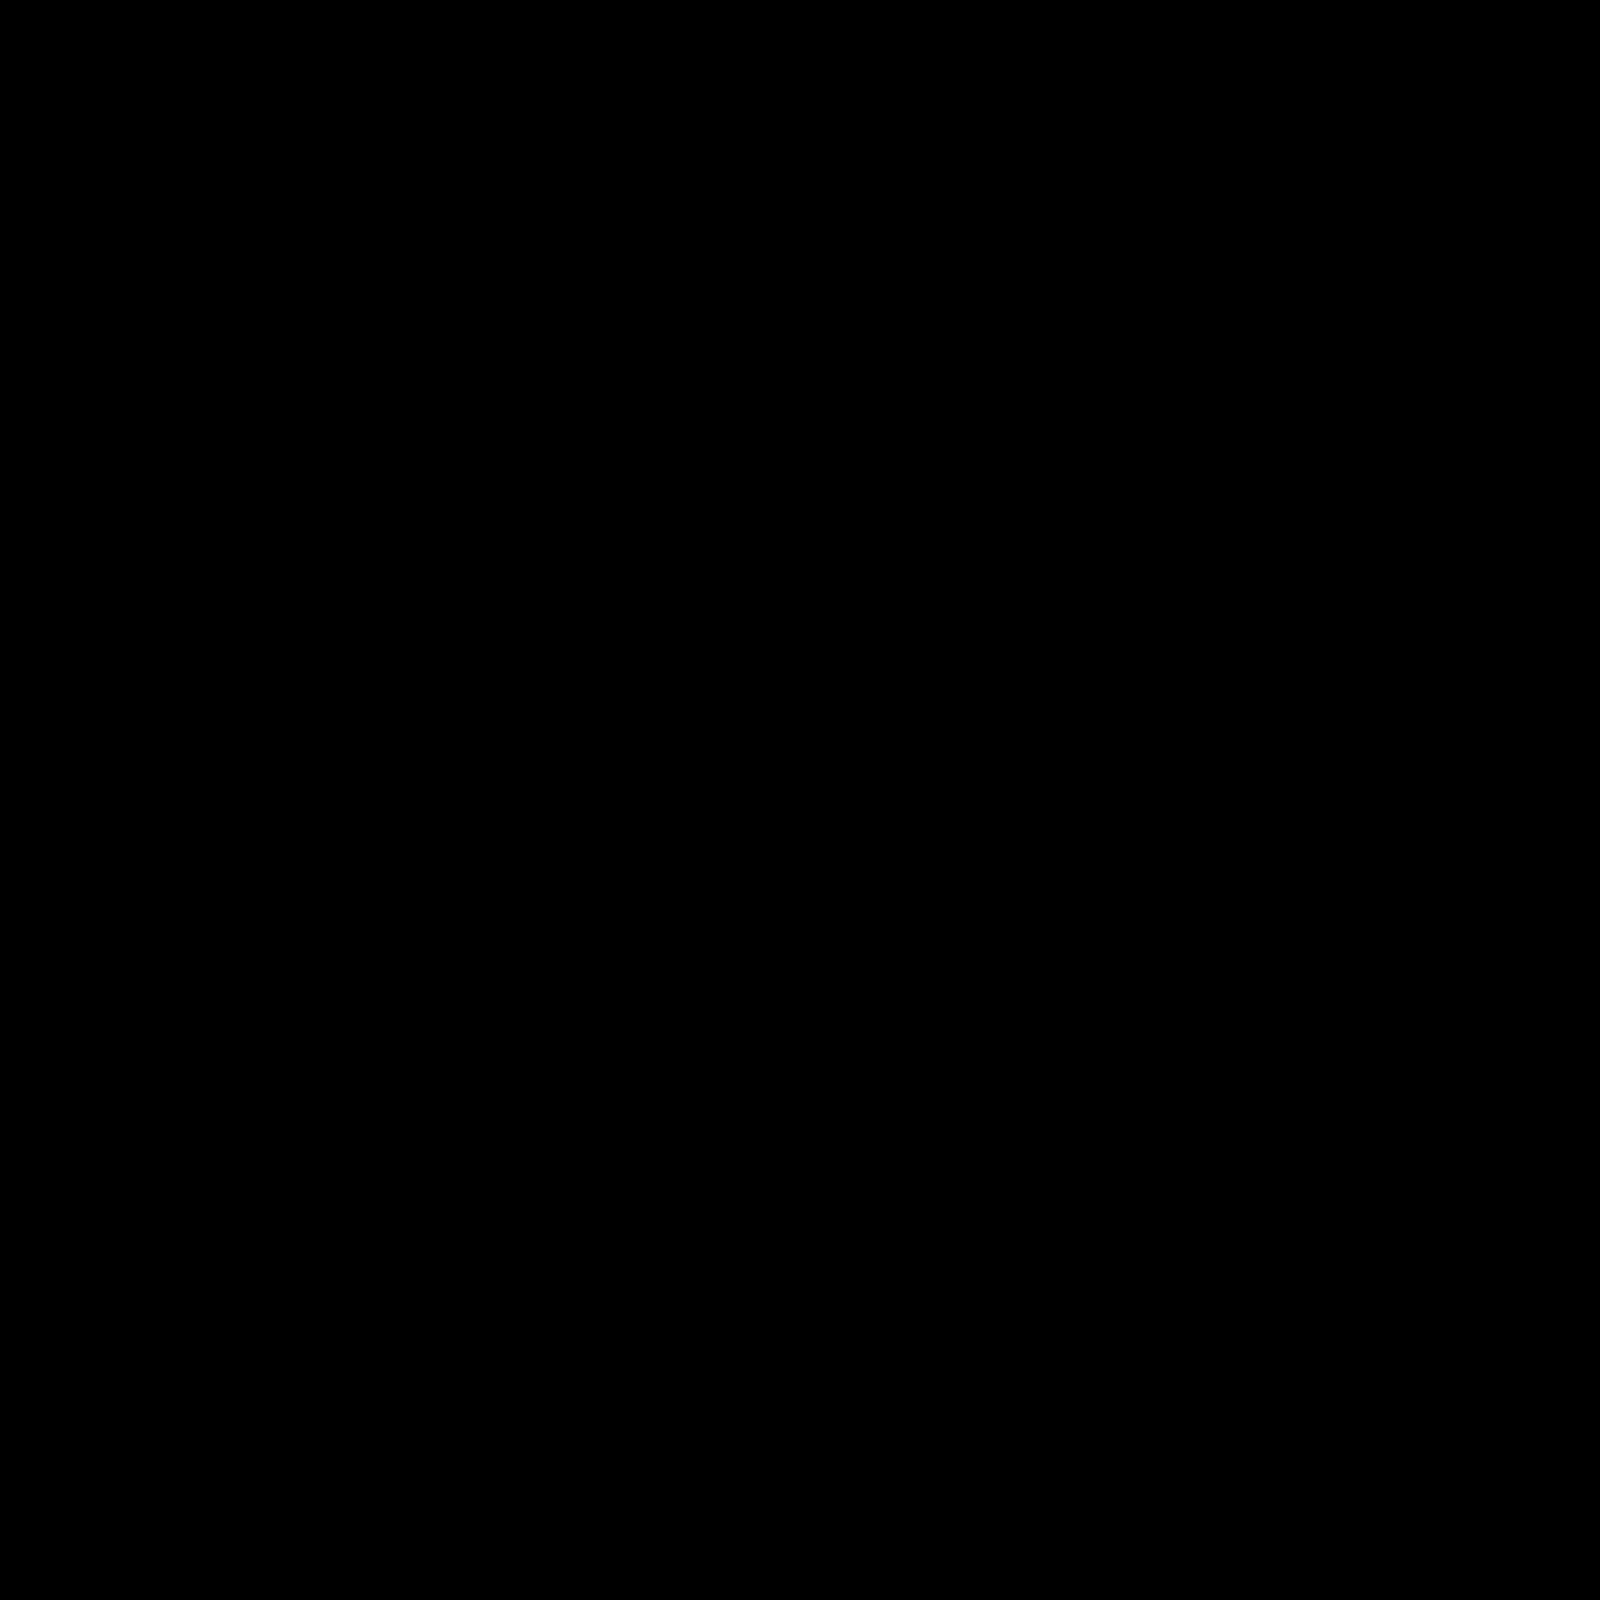 Calligraphy Brush icon